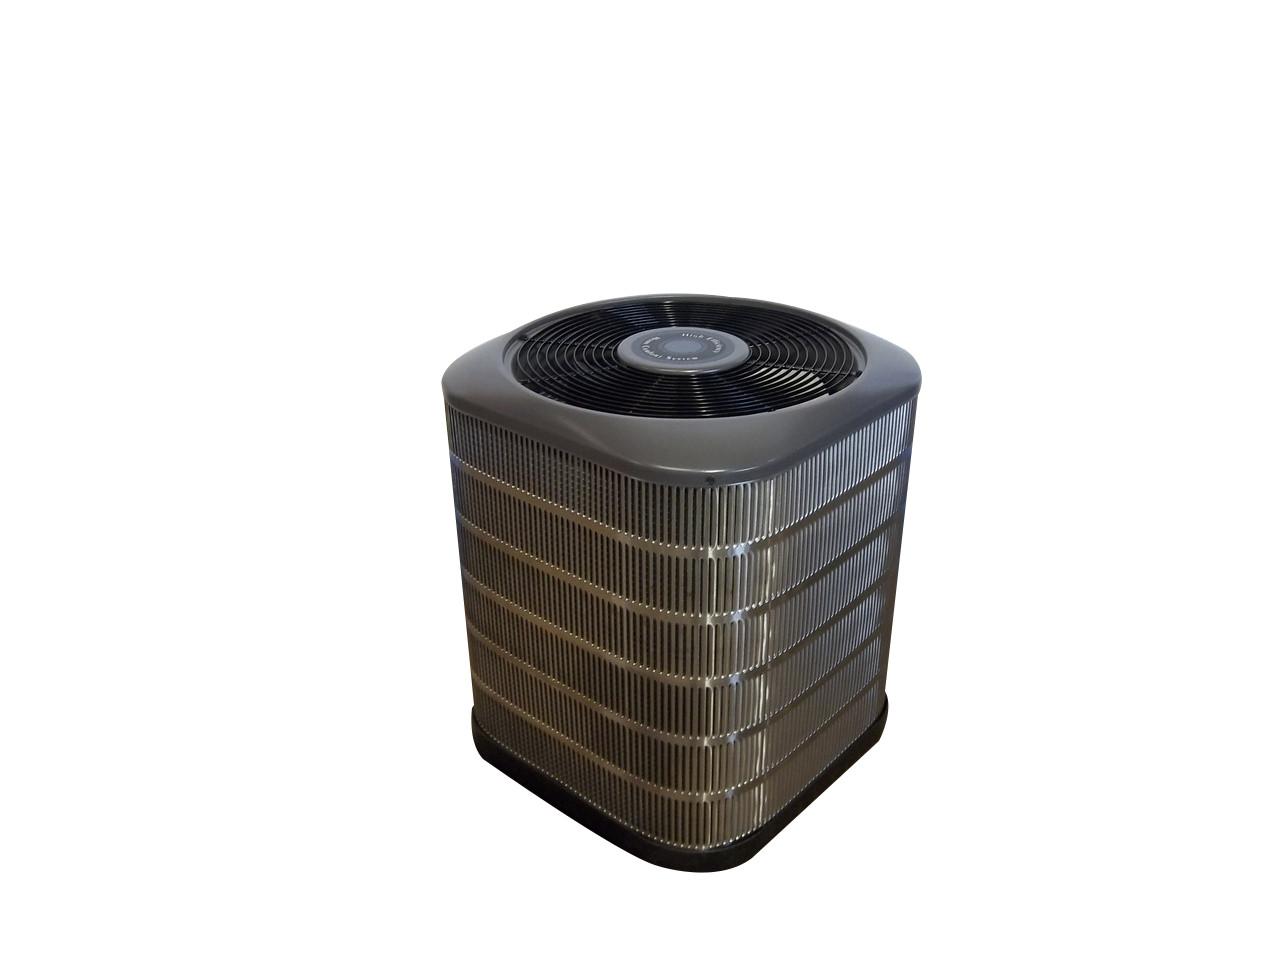 maytag new ac condenser psa4be018ka acc 6787 - Maytag Air Conditioner